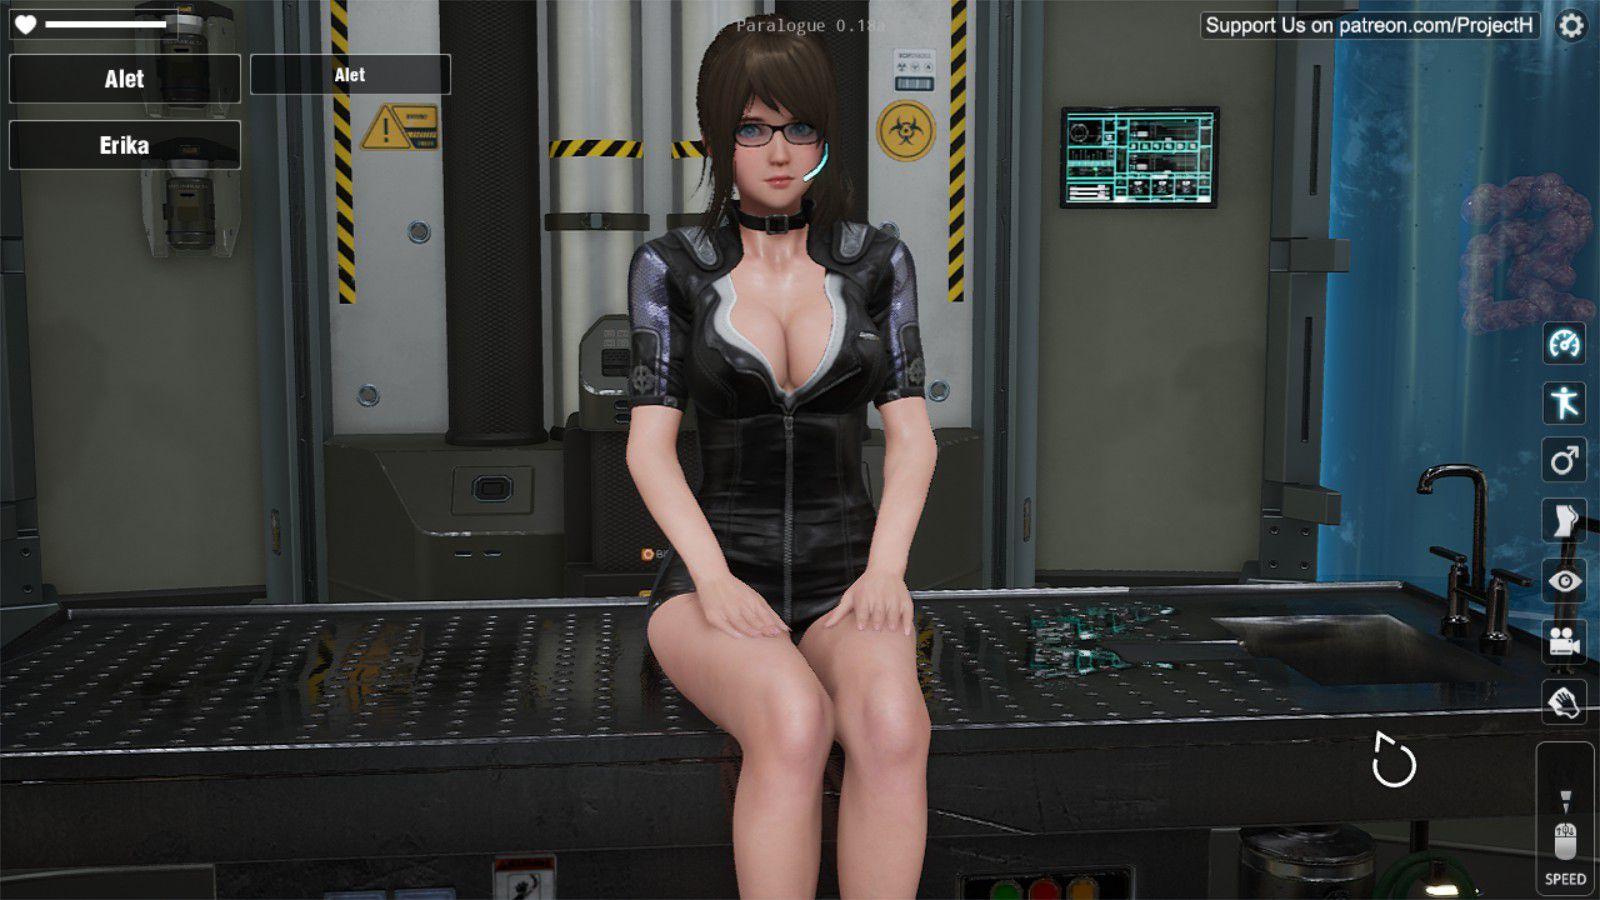 【3D互动/全动态】堕落玩偶 女2号:爱O行动 V0.22 破解版【大更新/新服装/场景/8G】